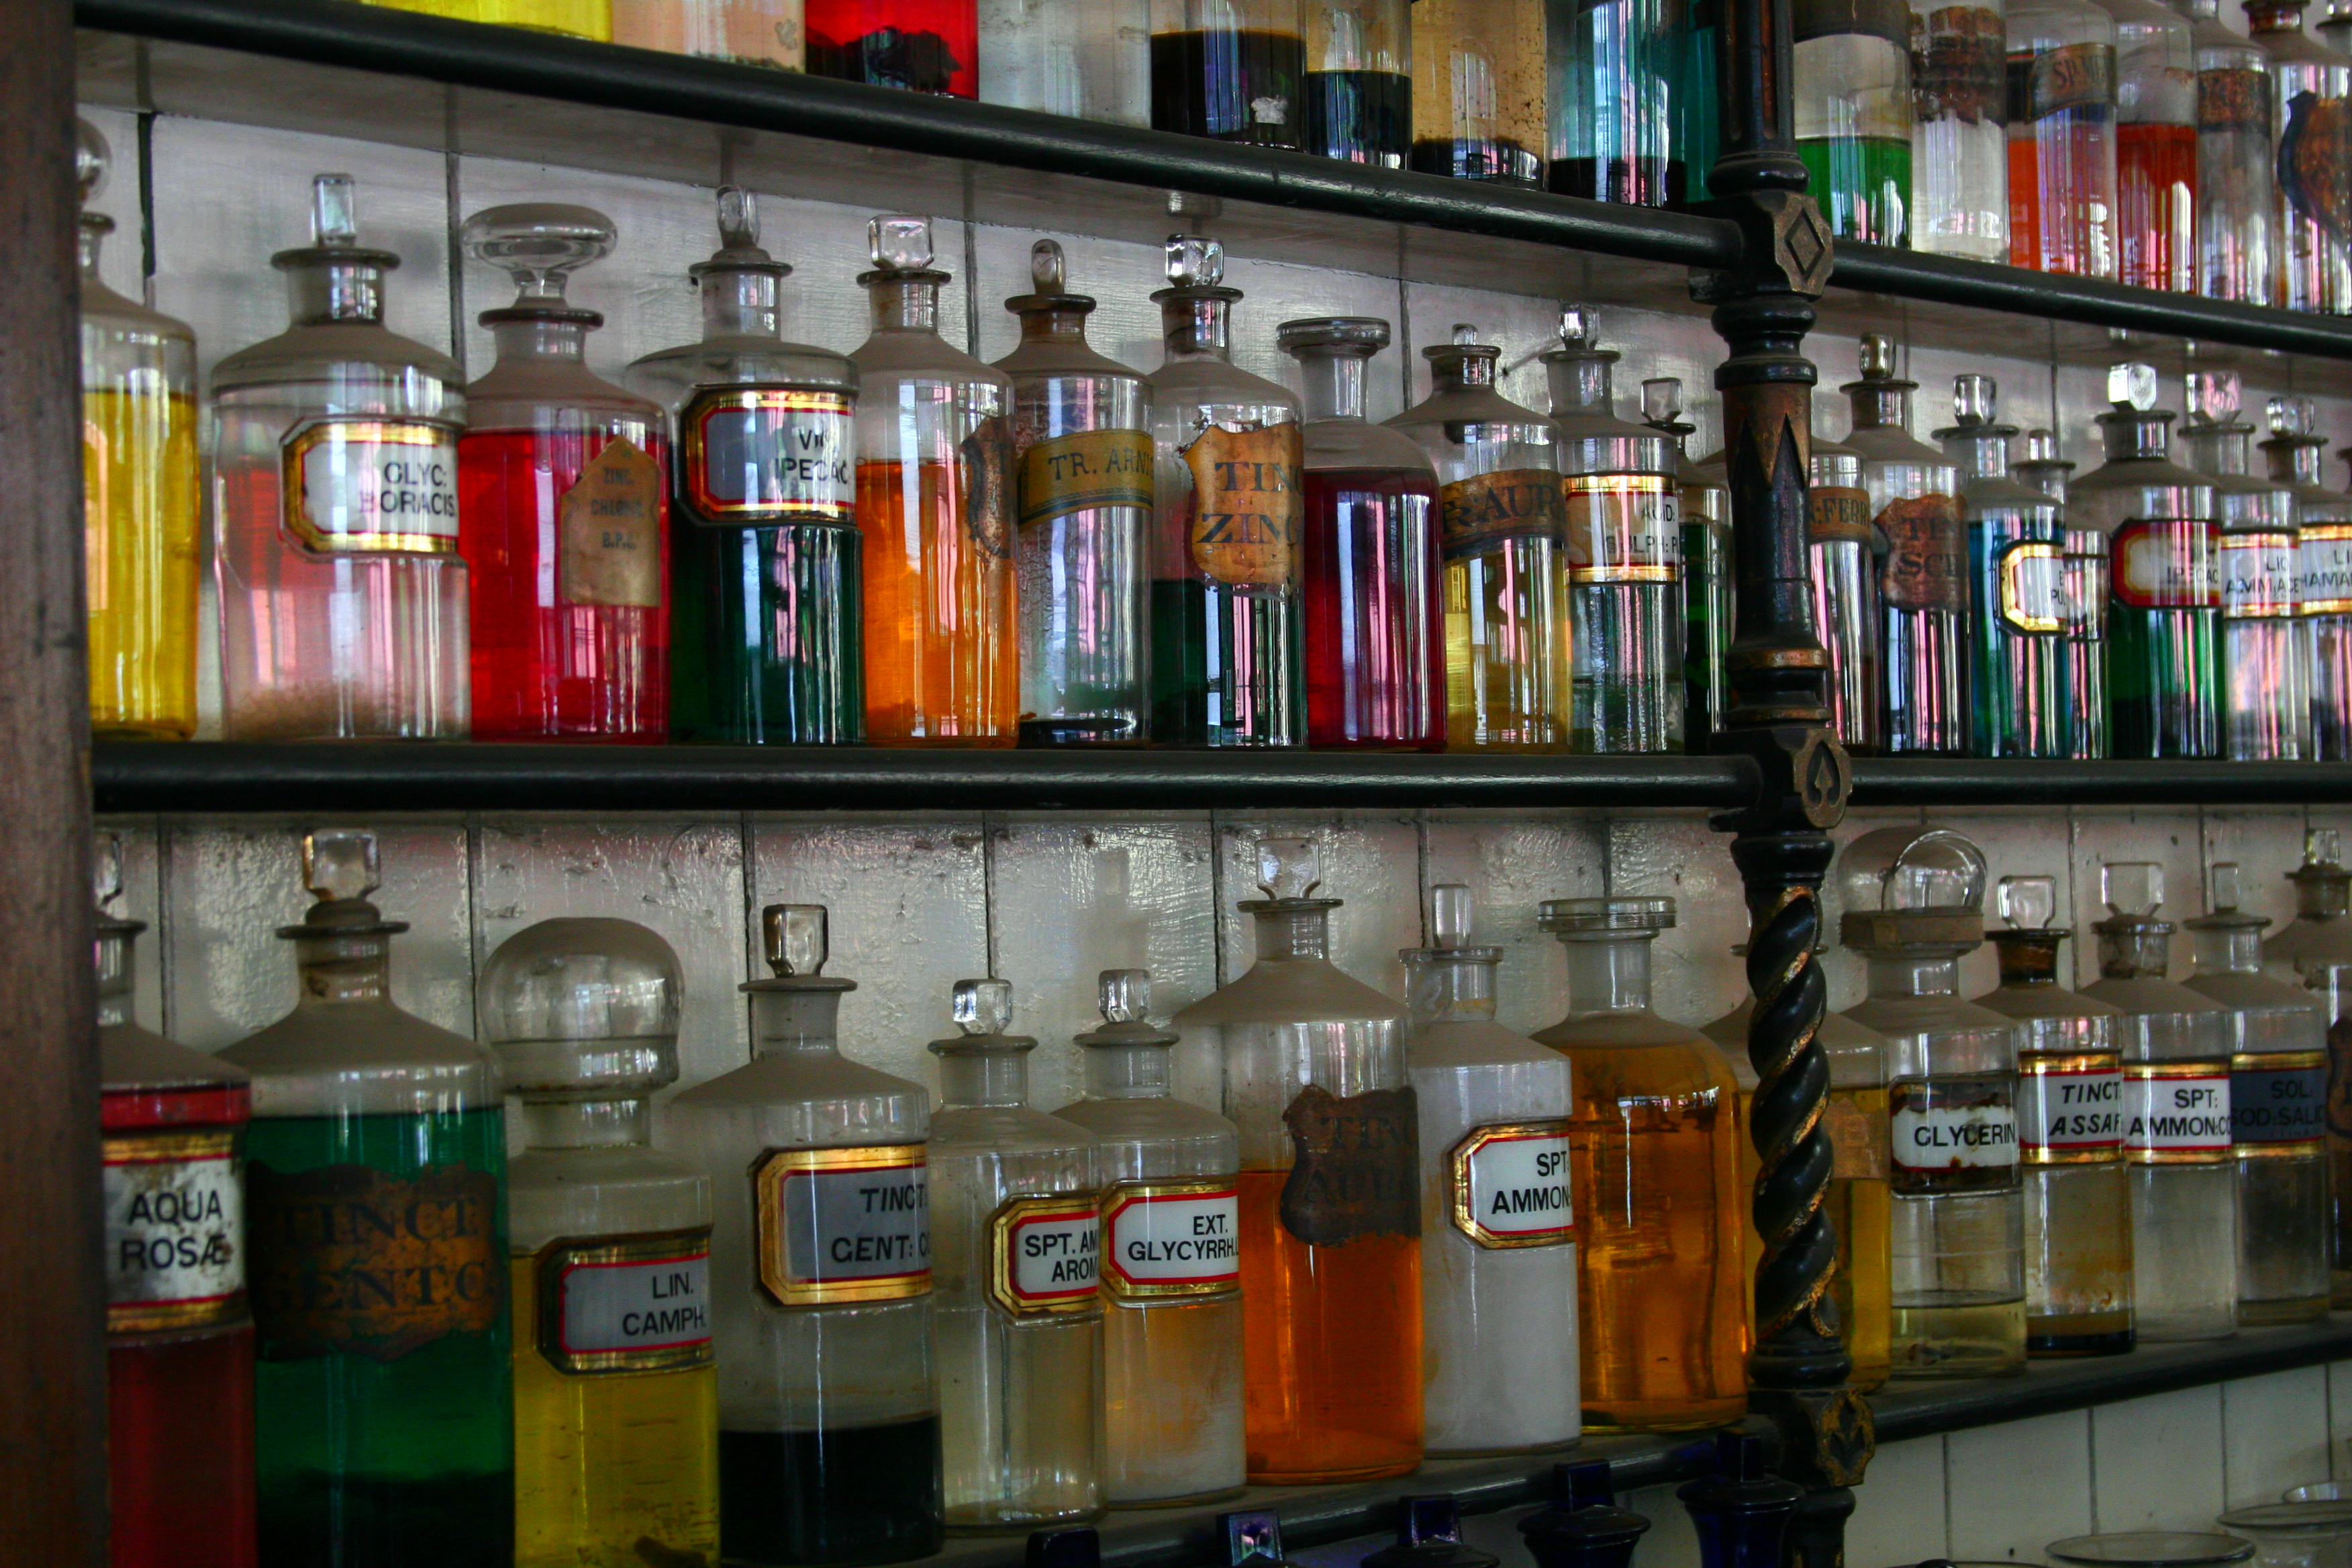 Inside Jekyll's lab